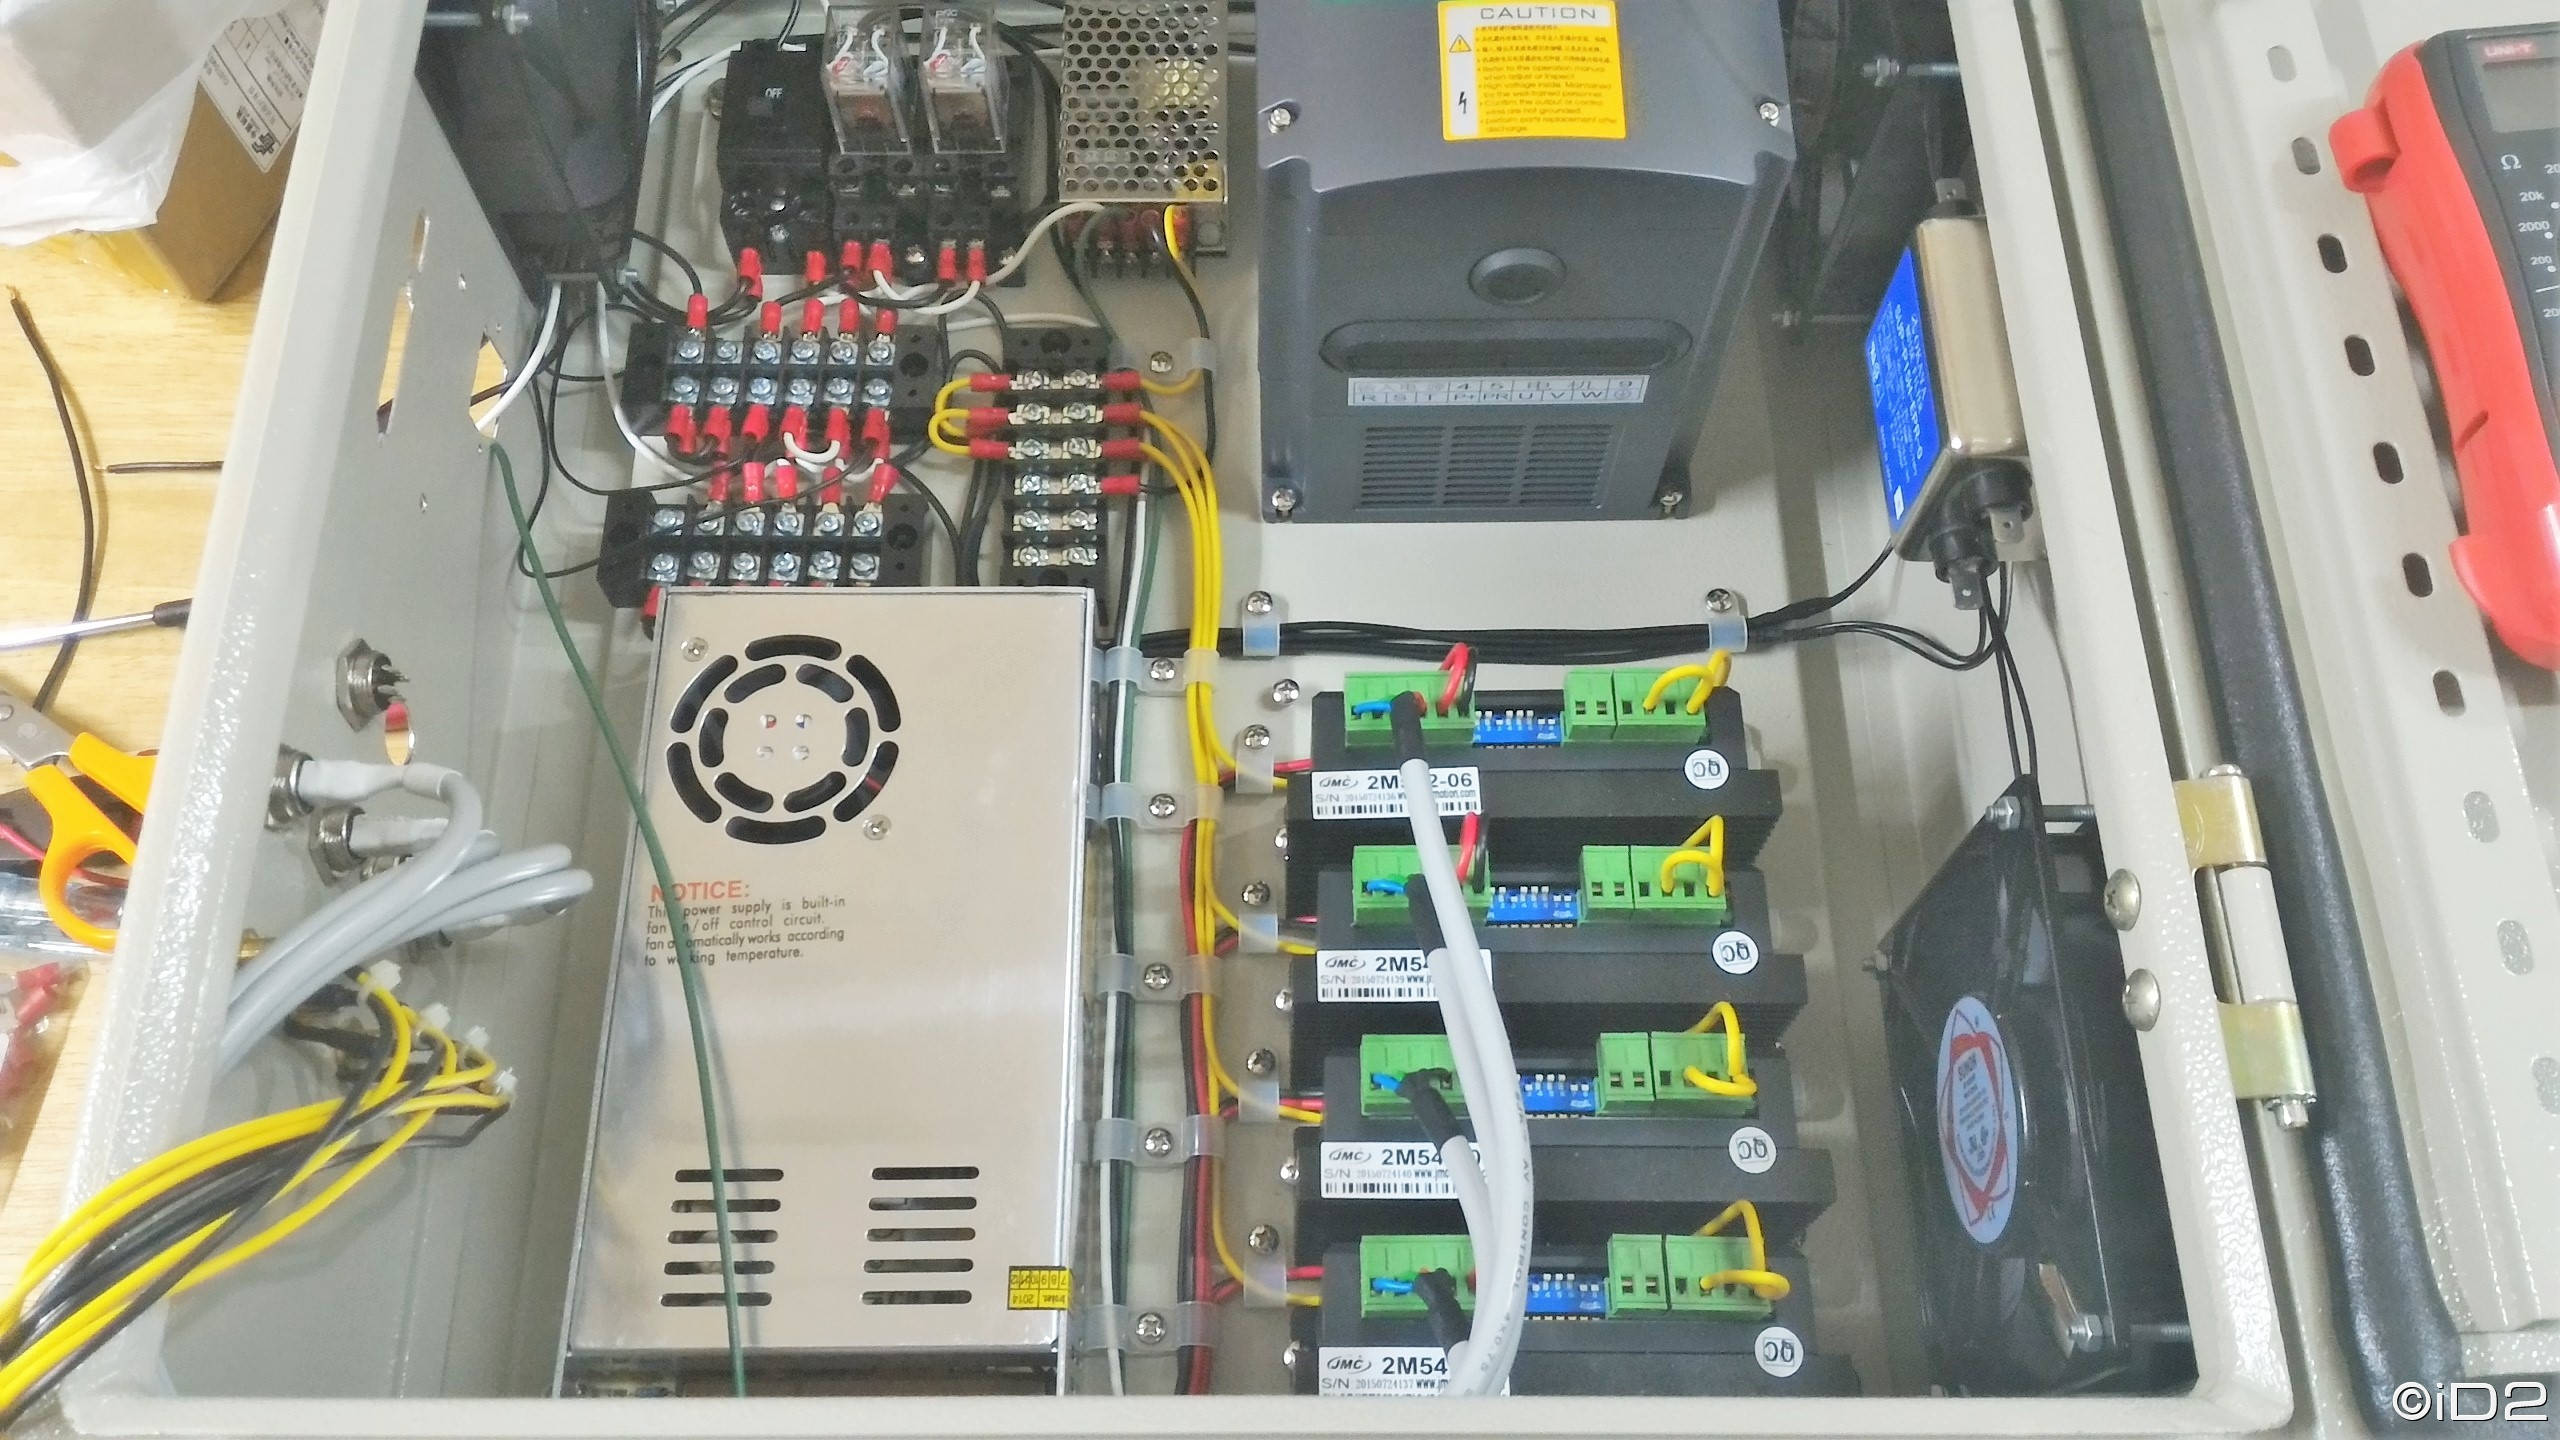 cnc control box wiring diagram wiring schematic diagram CNC Driver Diagram cnc control box wiring diagram wiring diagram control panel wiring diagram controller box build \\\\